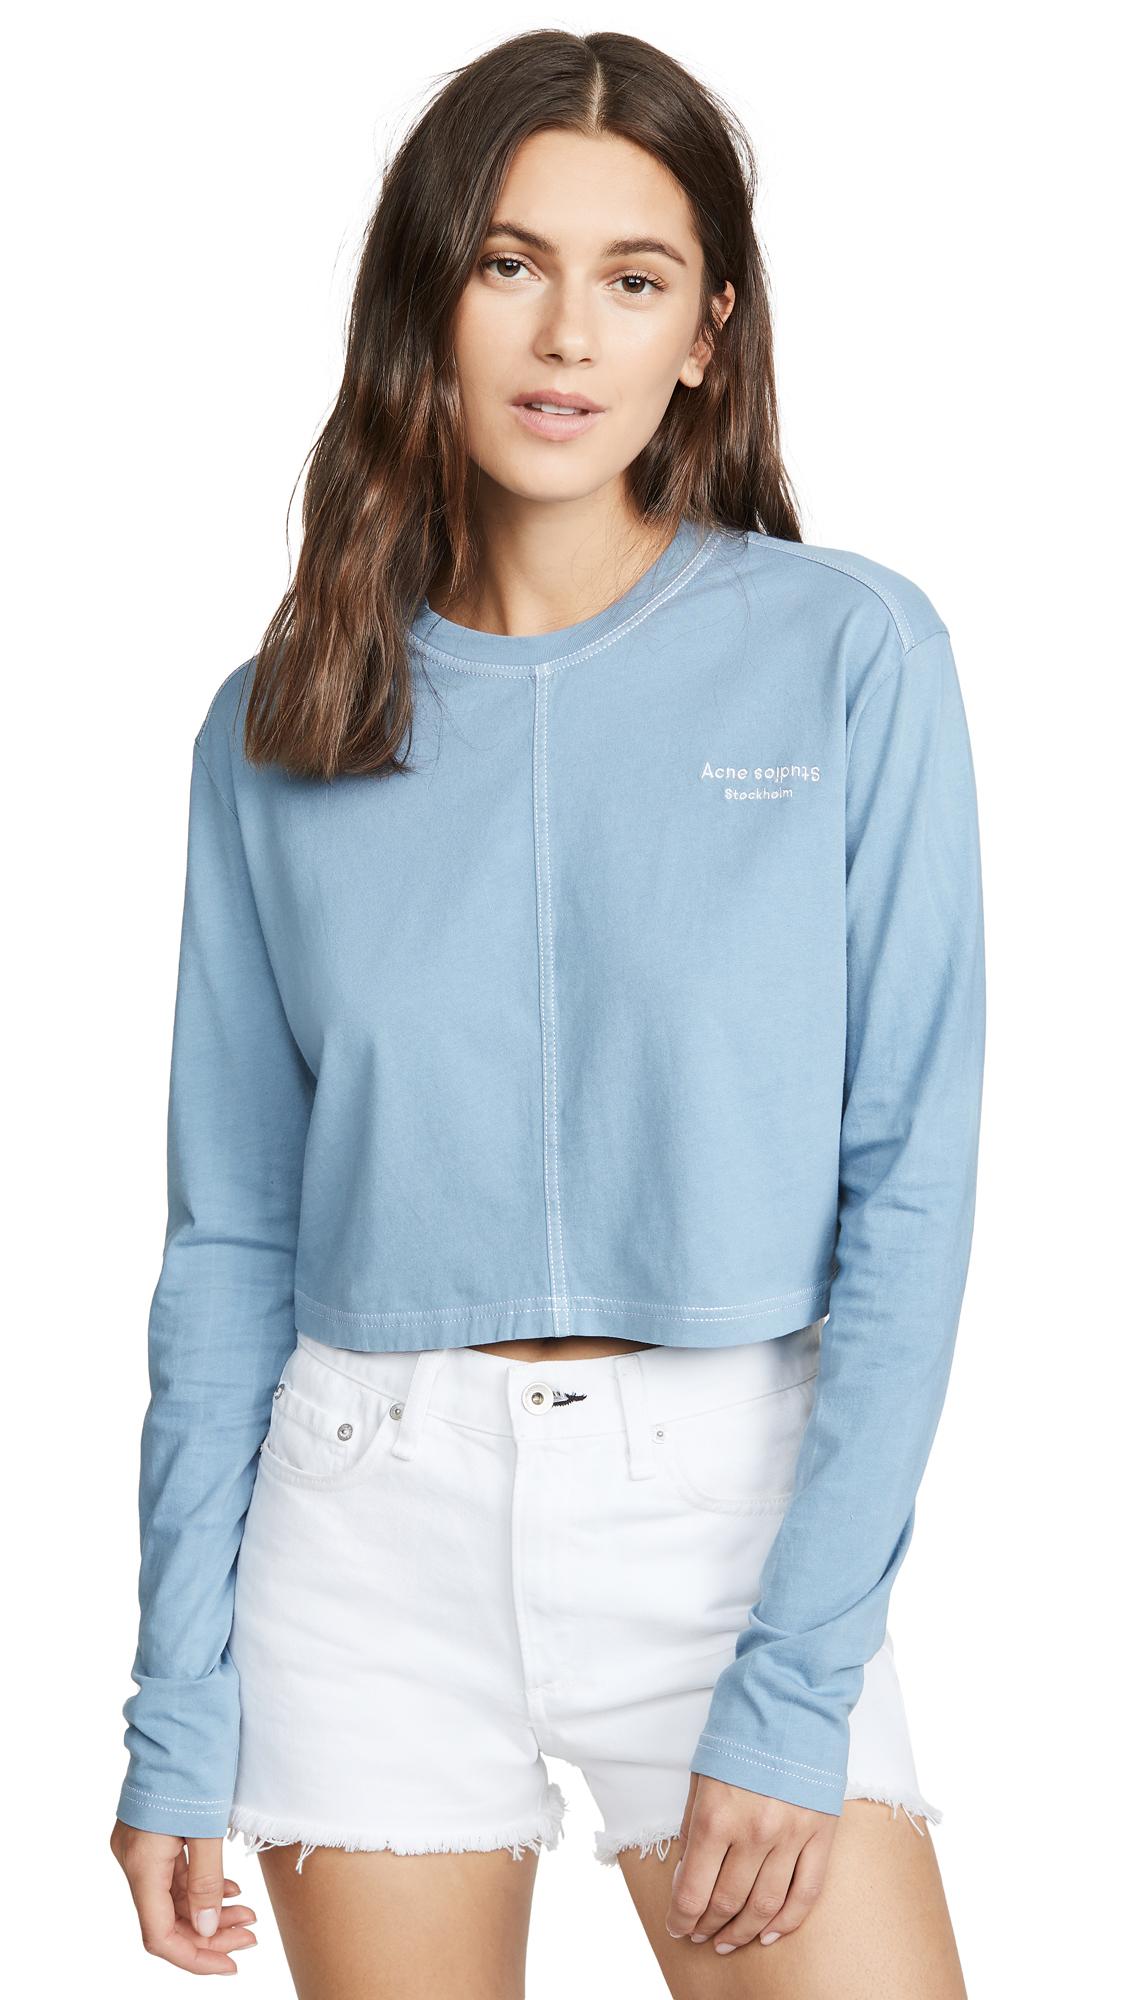 Acne Studios Elvana Acid Wash T-Shirt - Dusty Blue